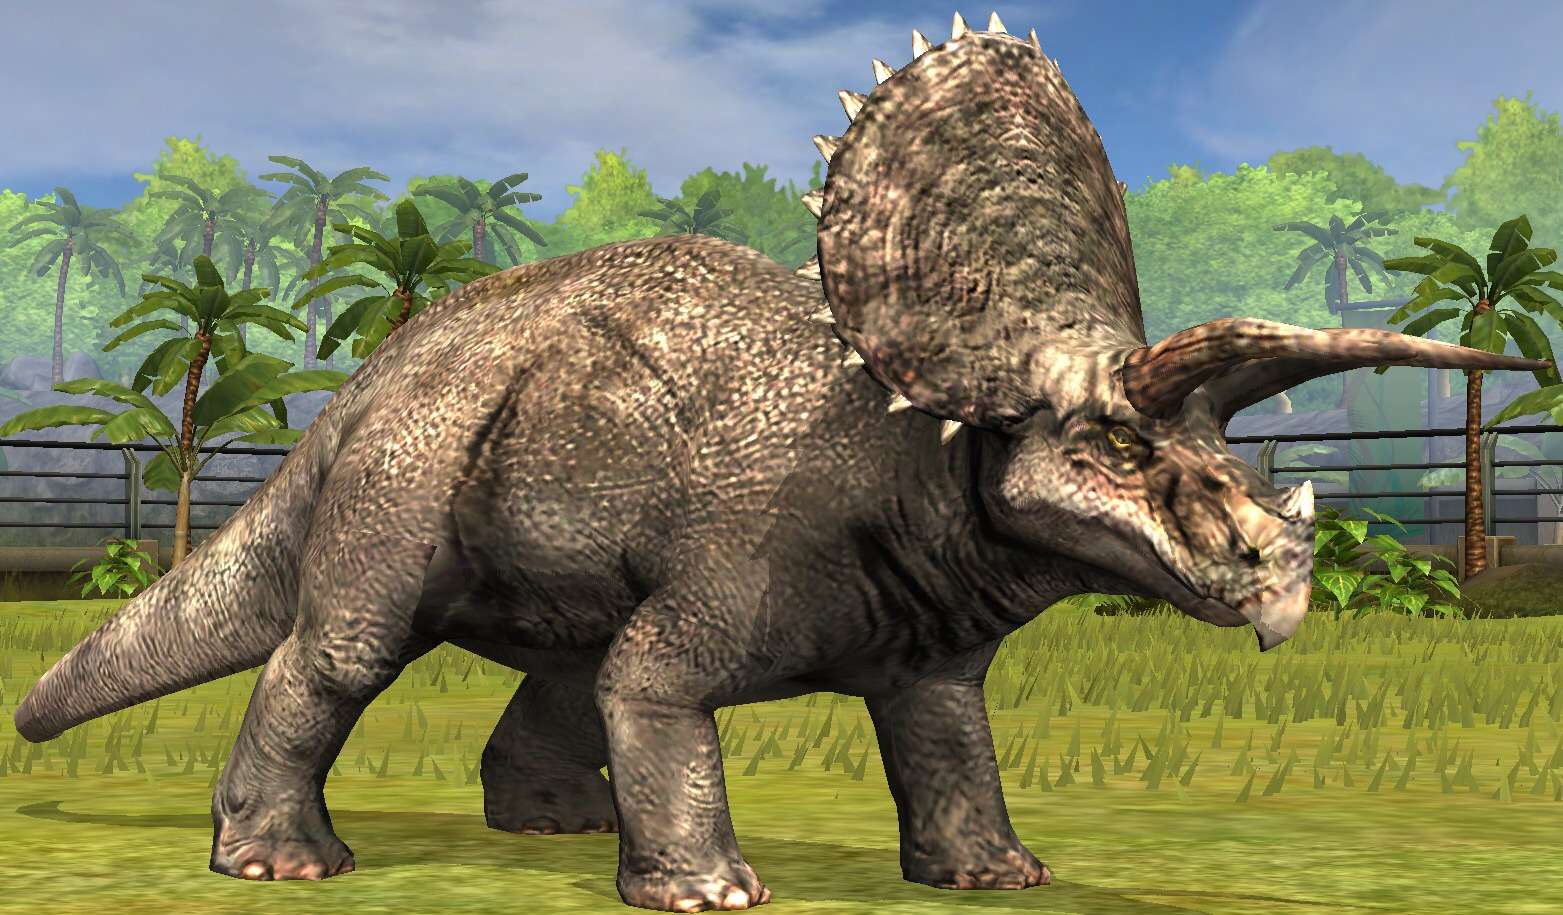 image triceratops lvl 10 jpg jurassic park wiki fandom powered